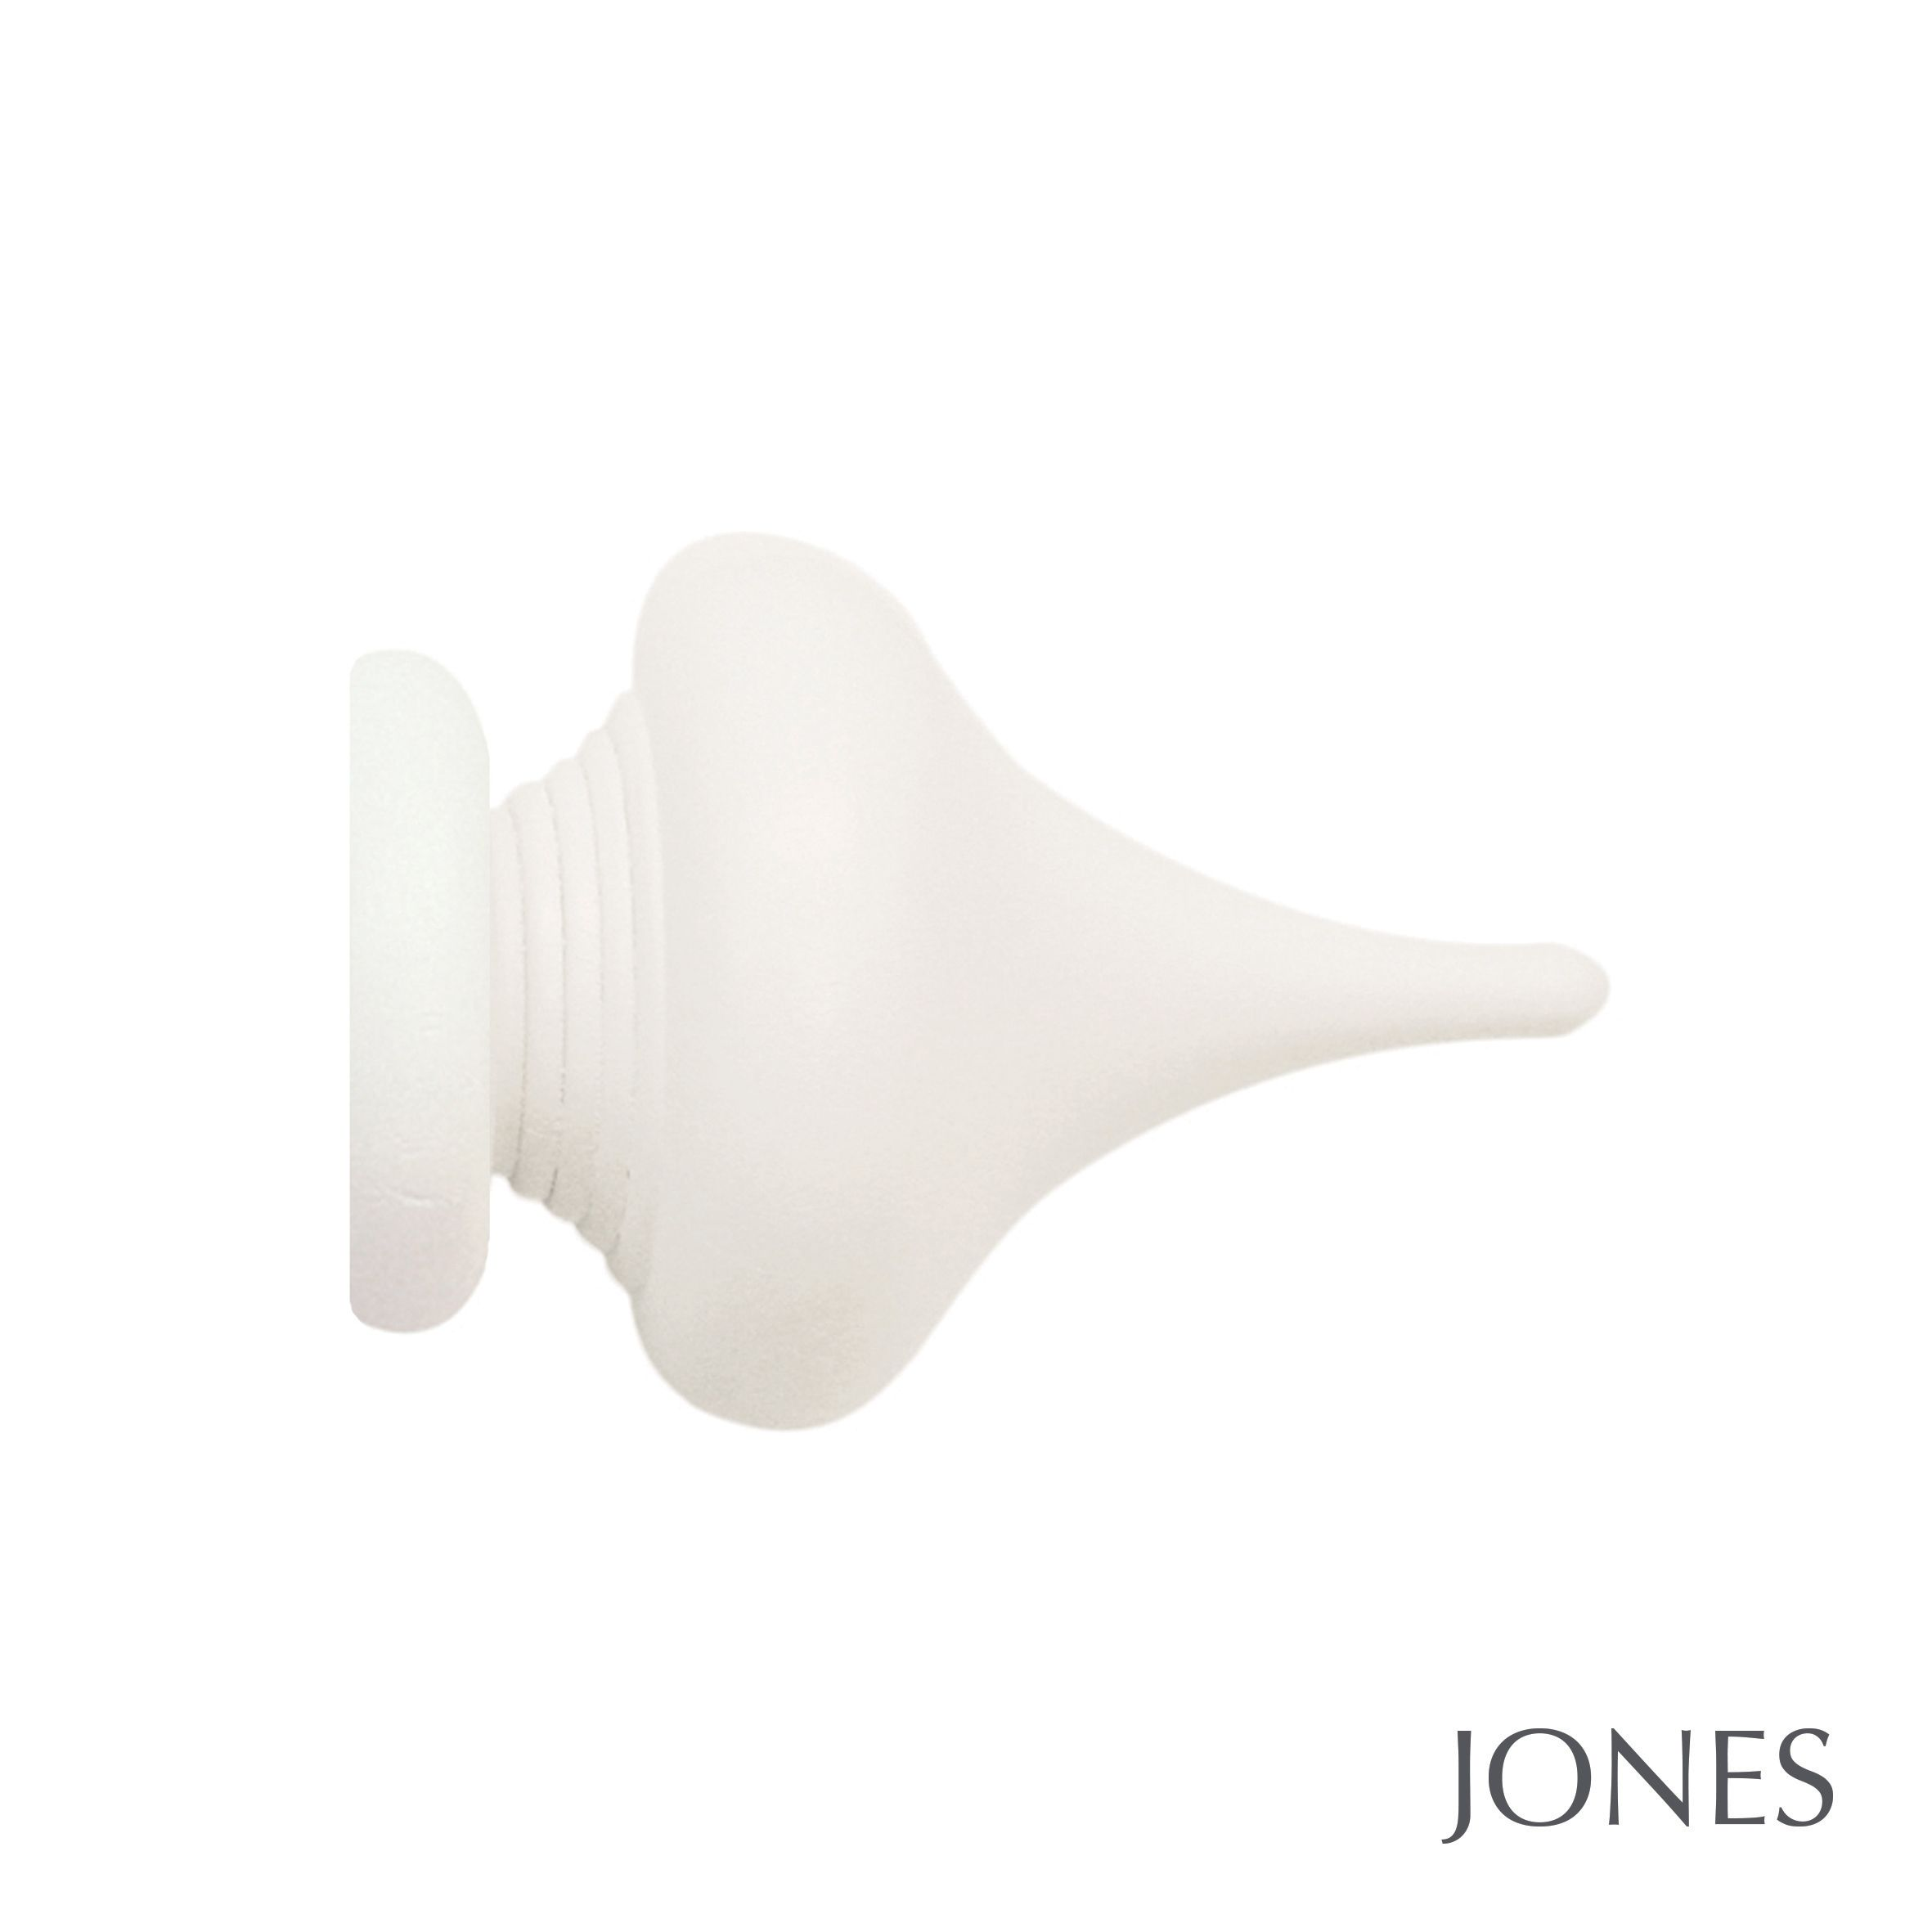 40mm Jones Minaret Finial cotton